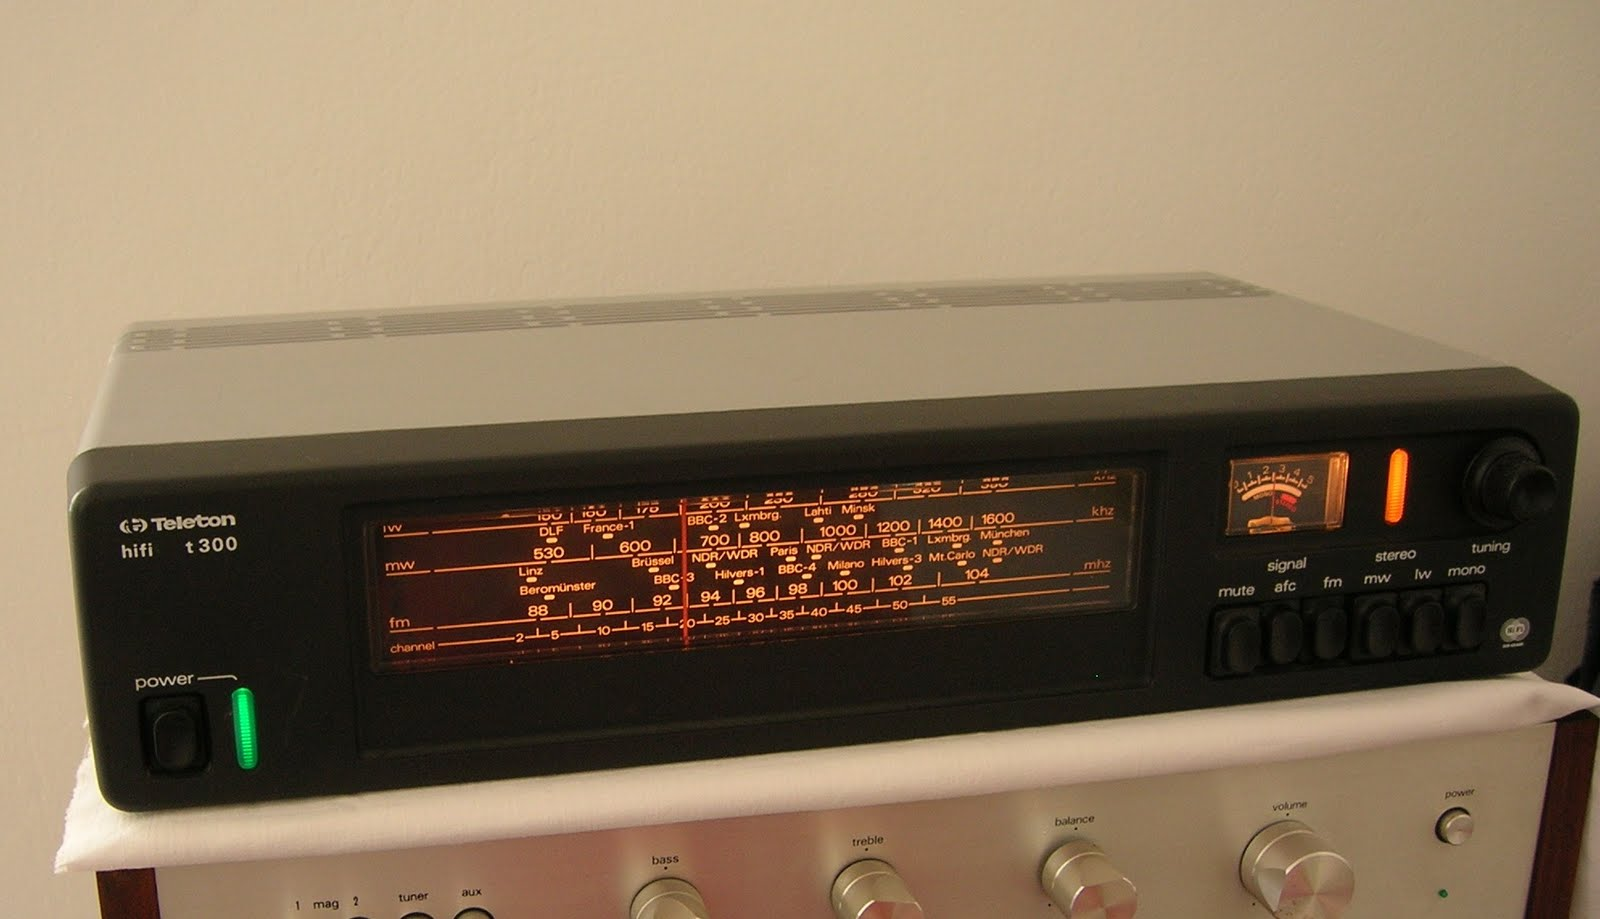 Sintonizadores Mitsubishi%2Bteleton%2Bt300%2B011